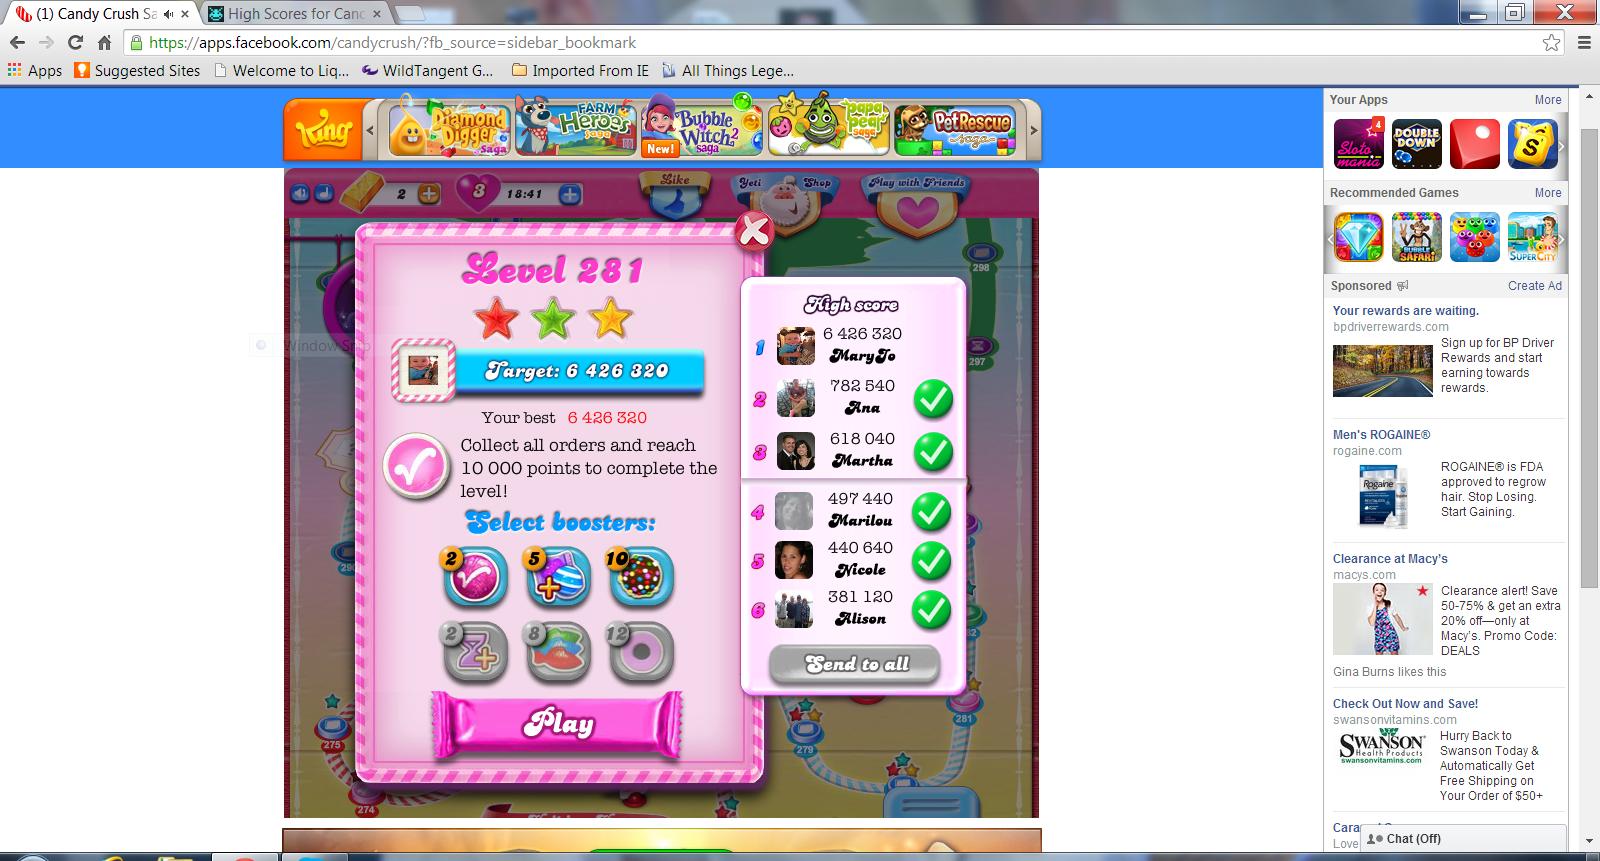 Candy Crush Saga: Level 281 6,426,320 points